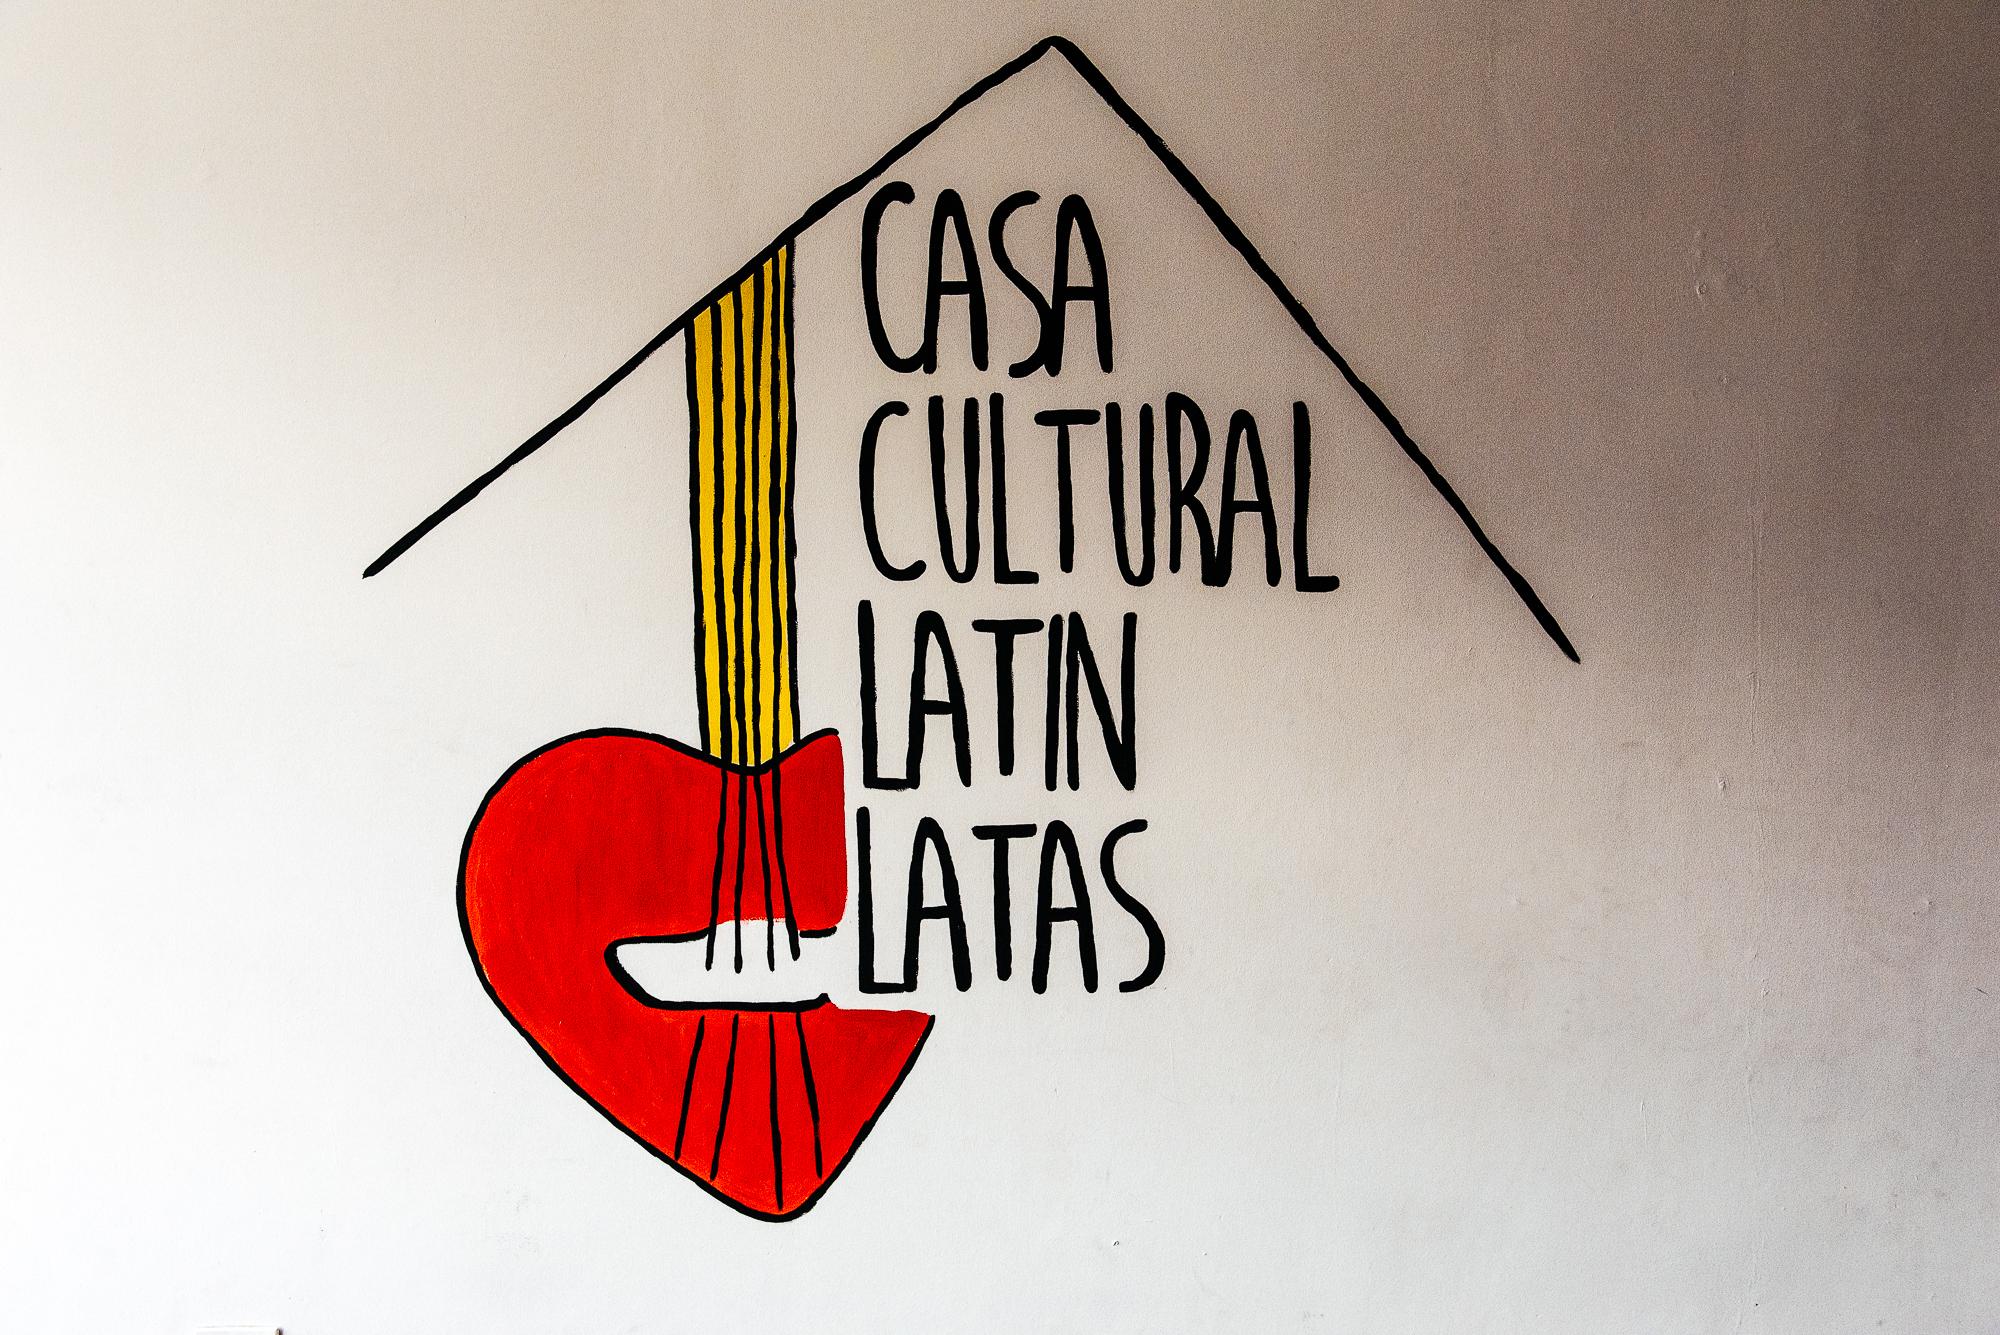 Latin Latas